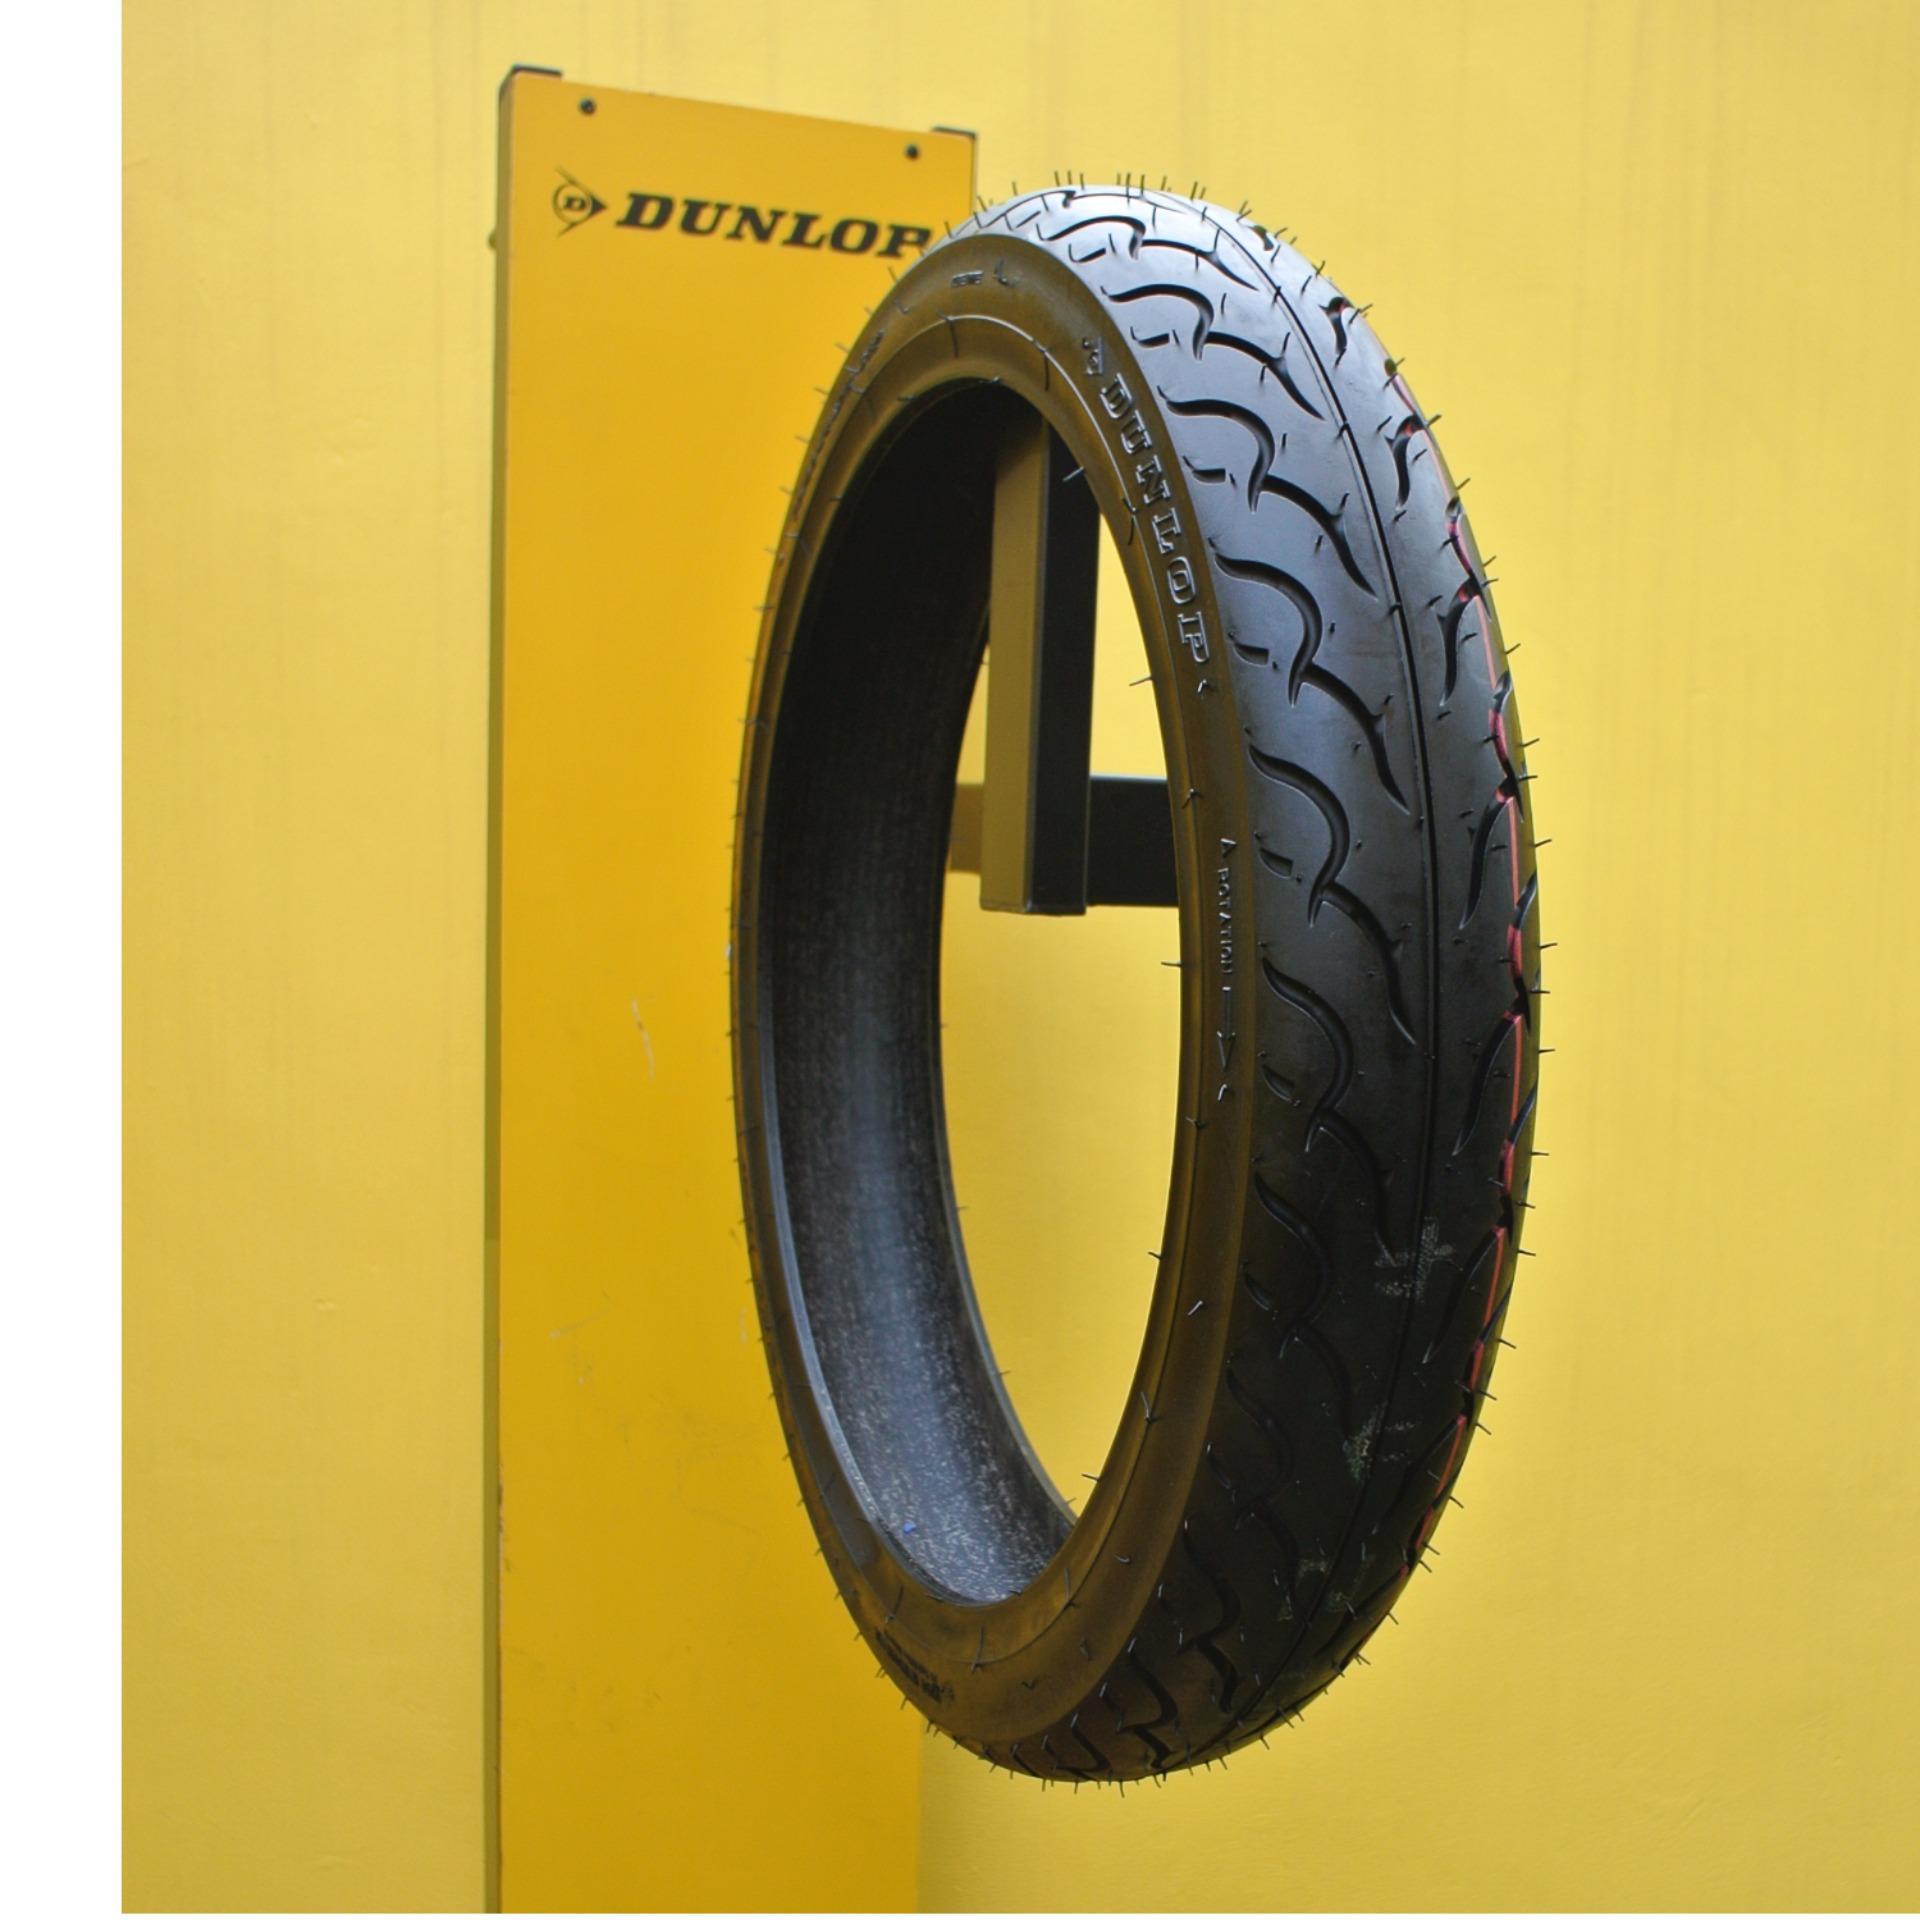 Philippines | Dunlop Tire TT901 70/90-14M 34P Tubetype Motorcycle